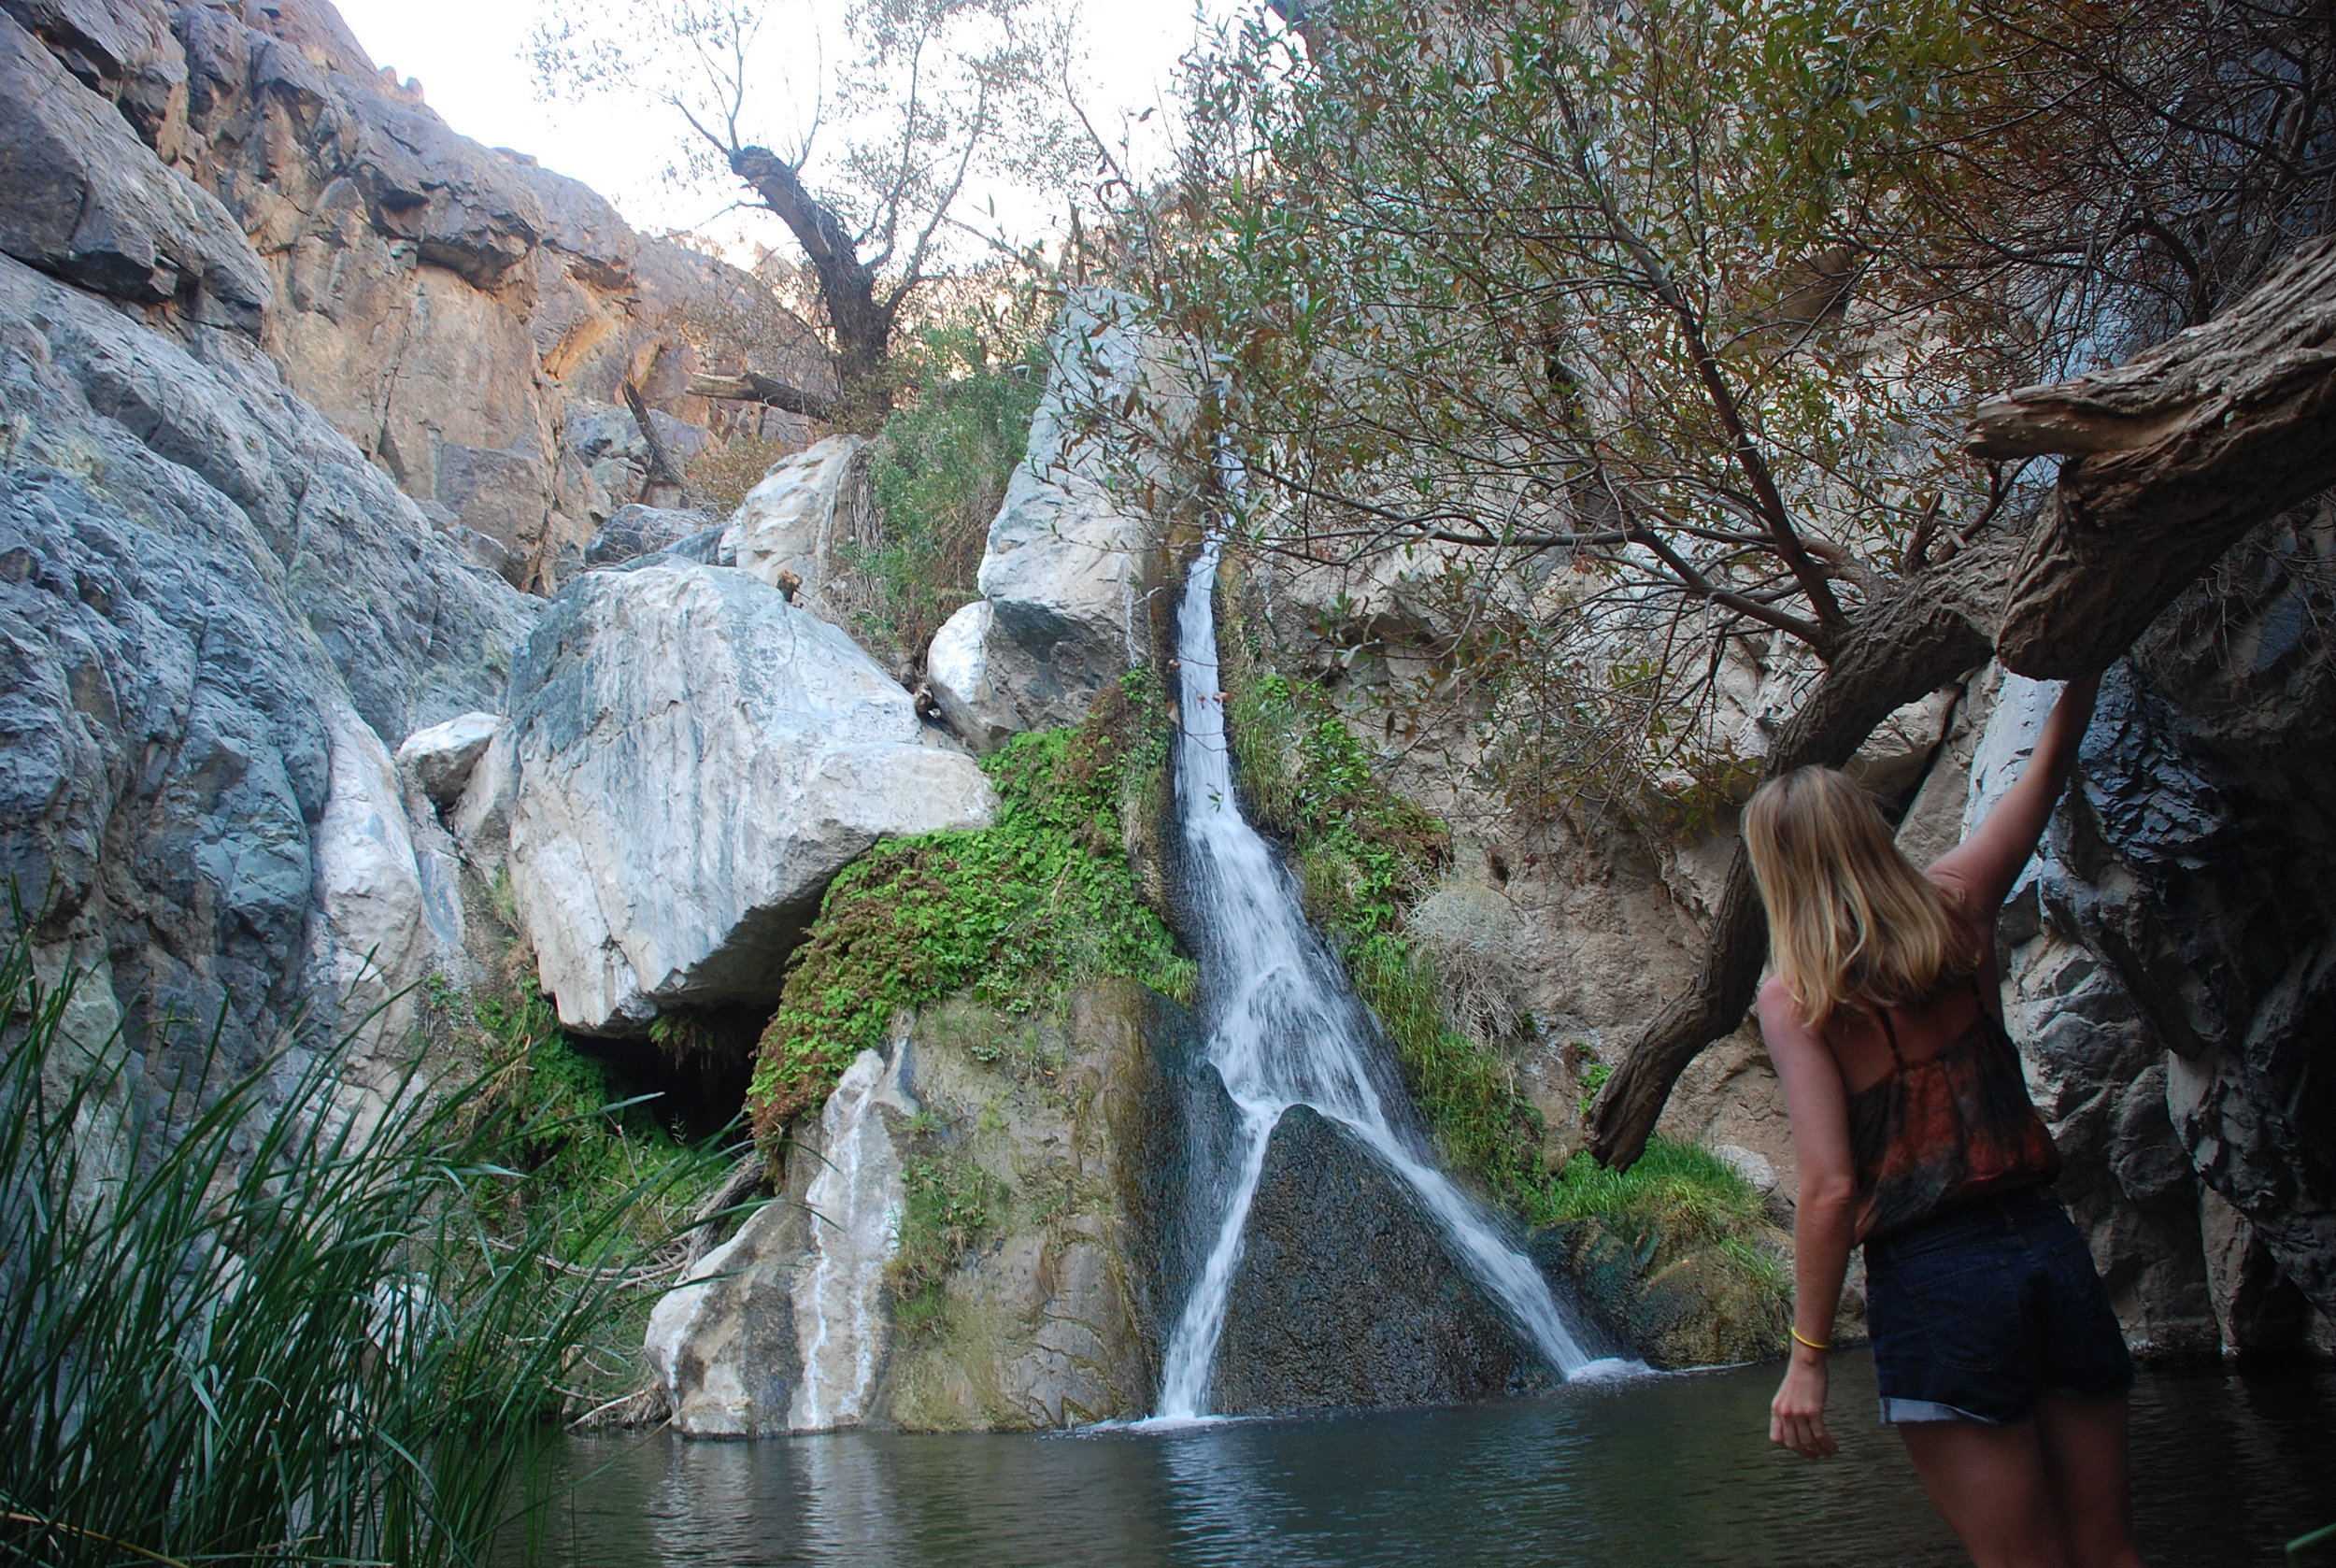 Darwin Falls (a short drive from camp)